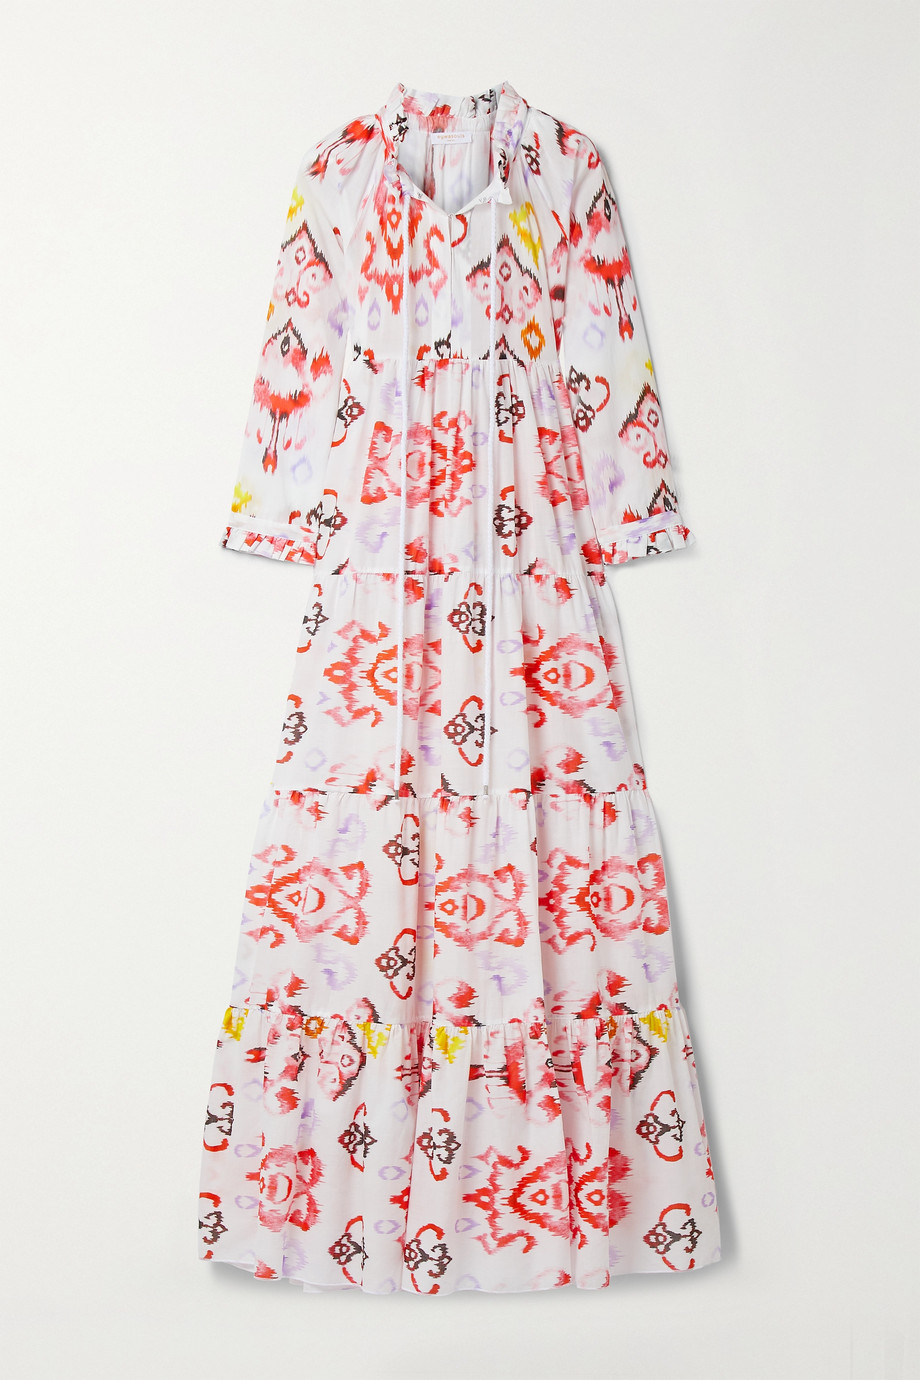 Eywasouls Malibu Cora Maxikleid aus Baumwoll-Voile mit Blumenprint